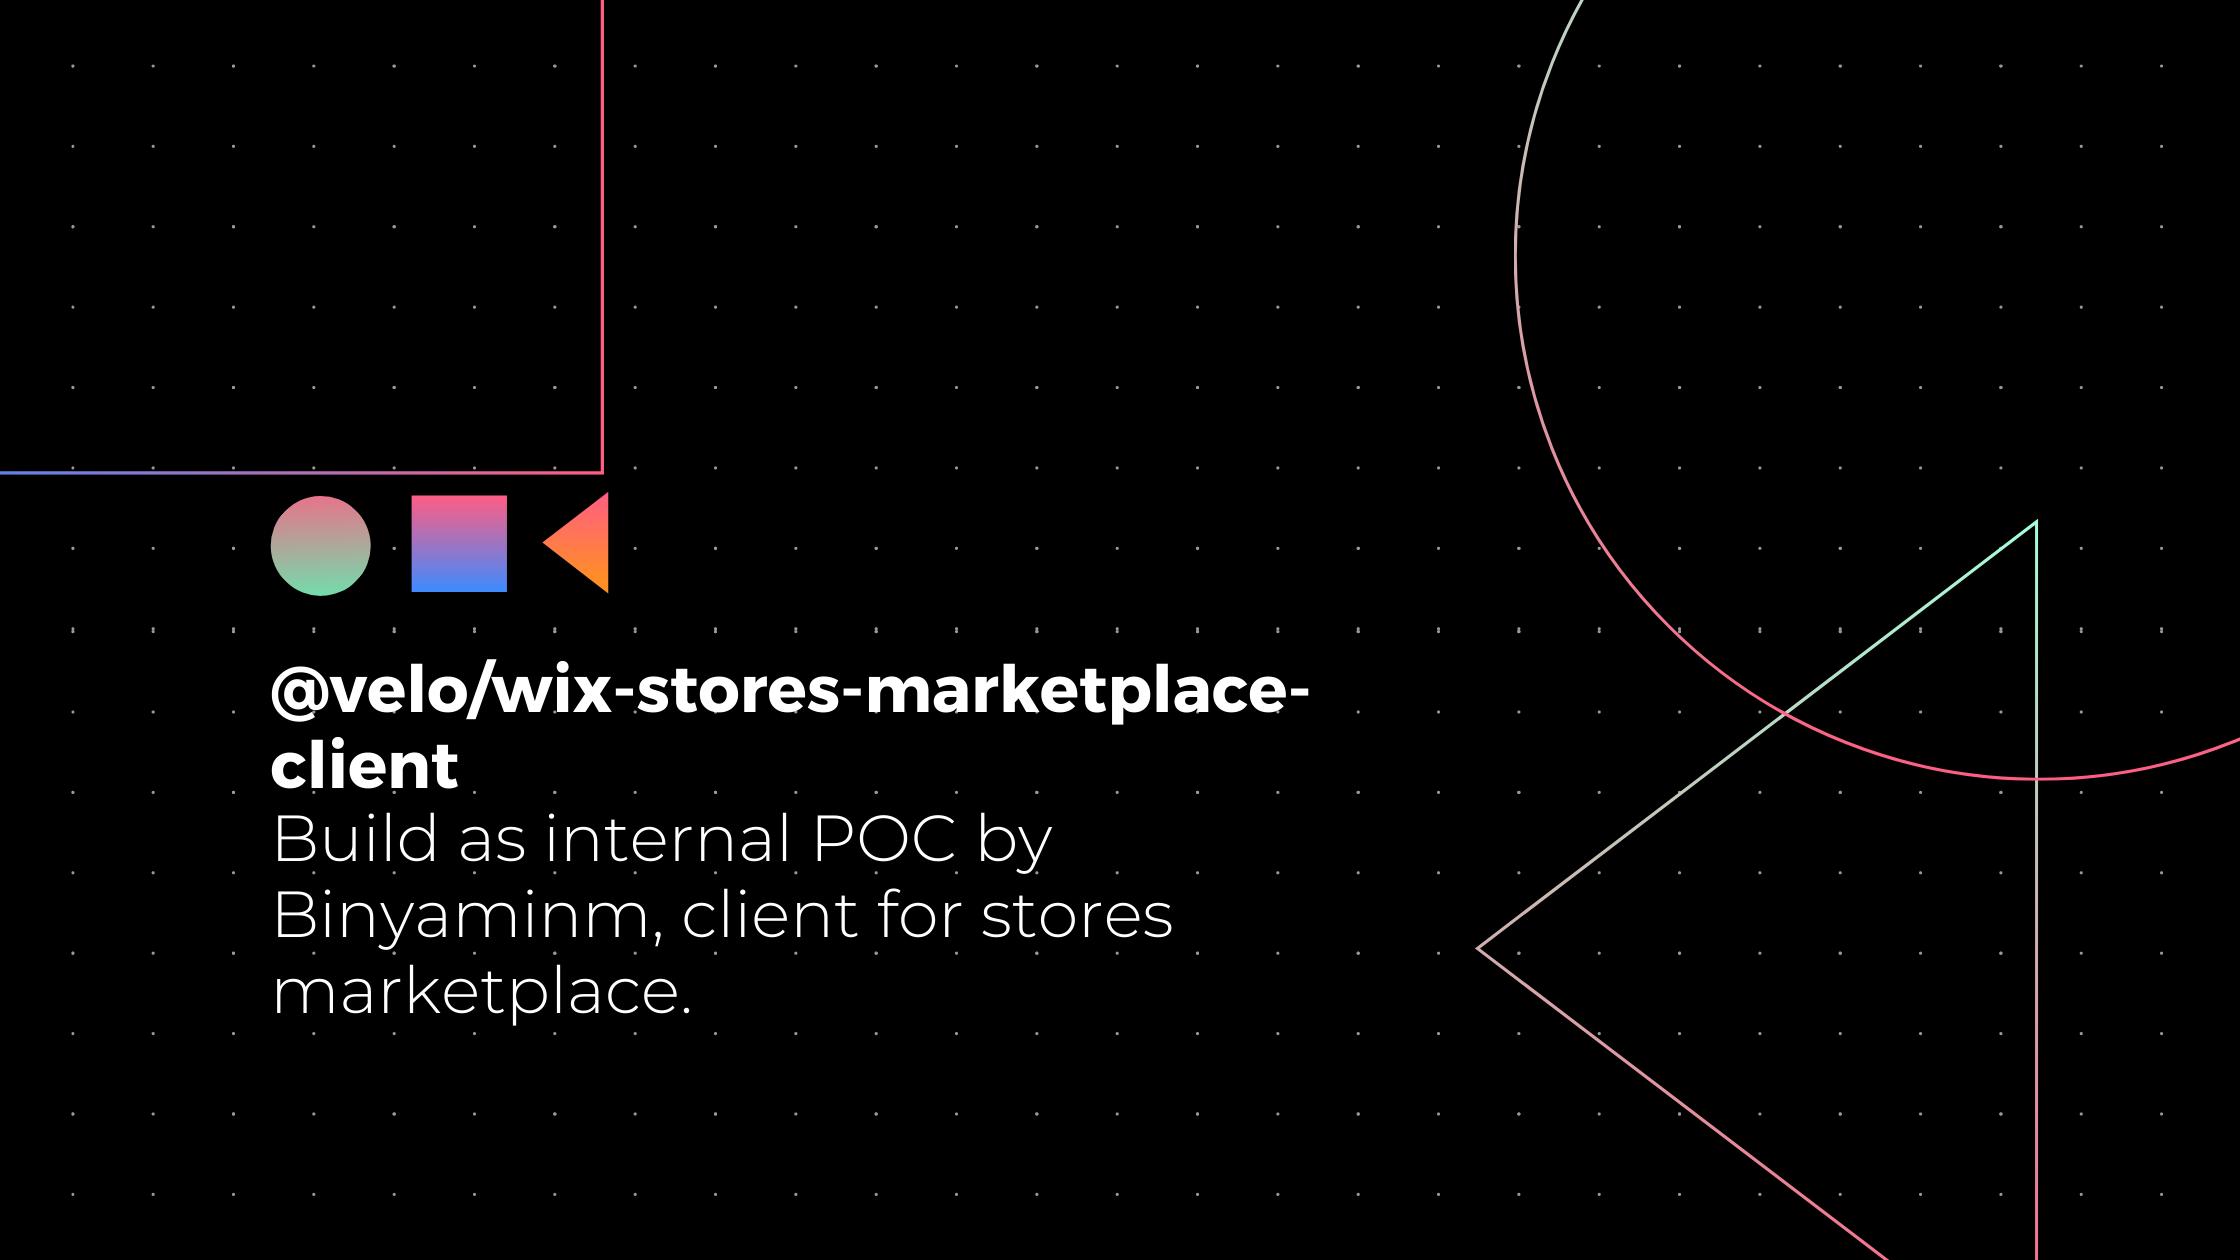 @velo/wix-stores-marketplace-client